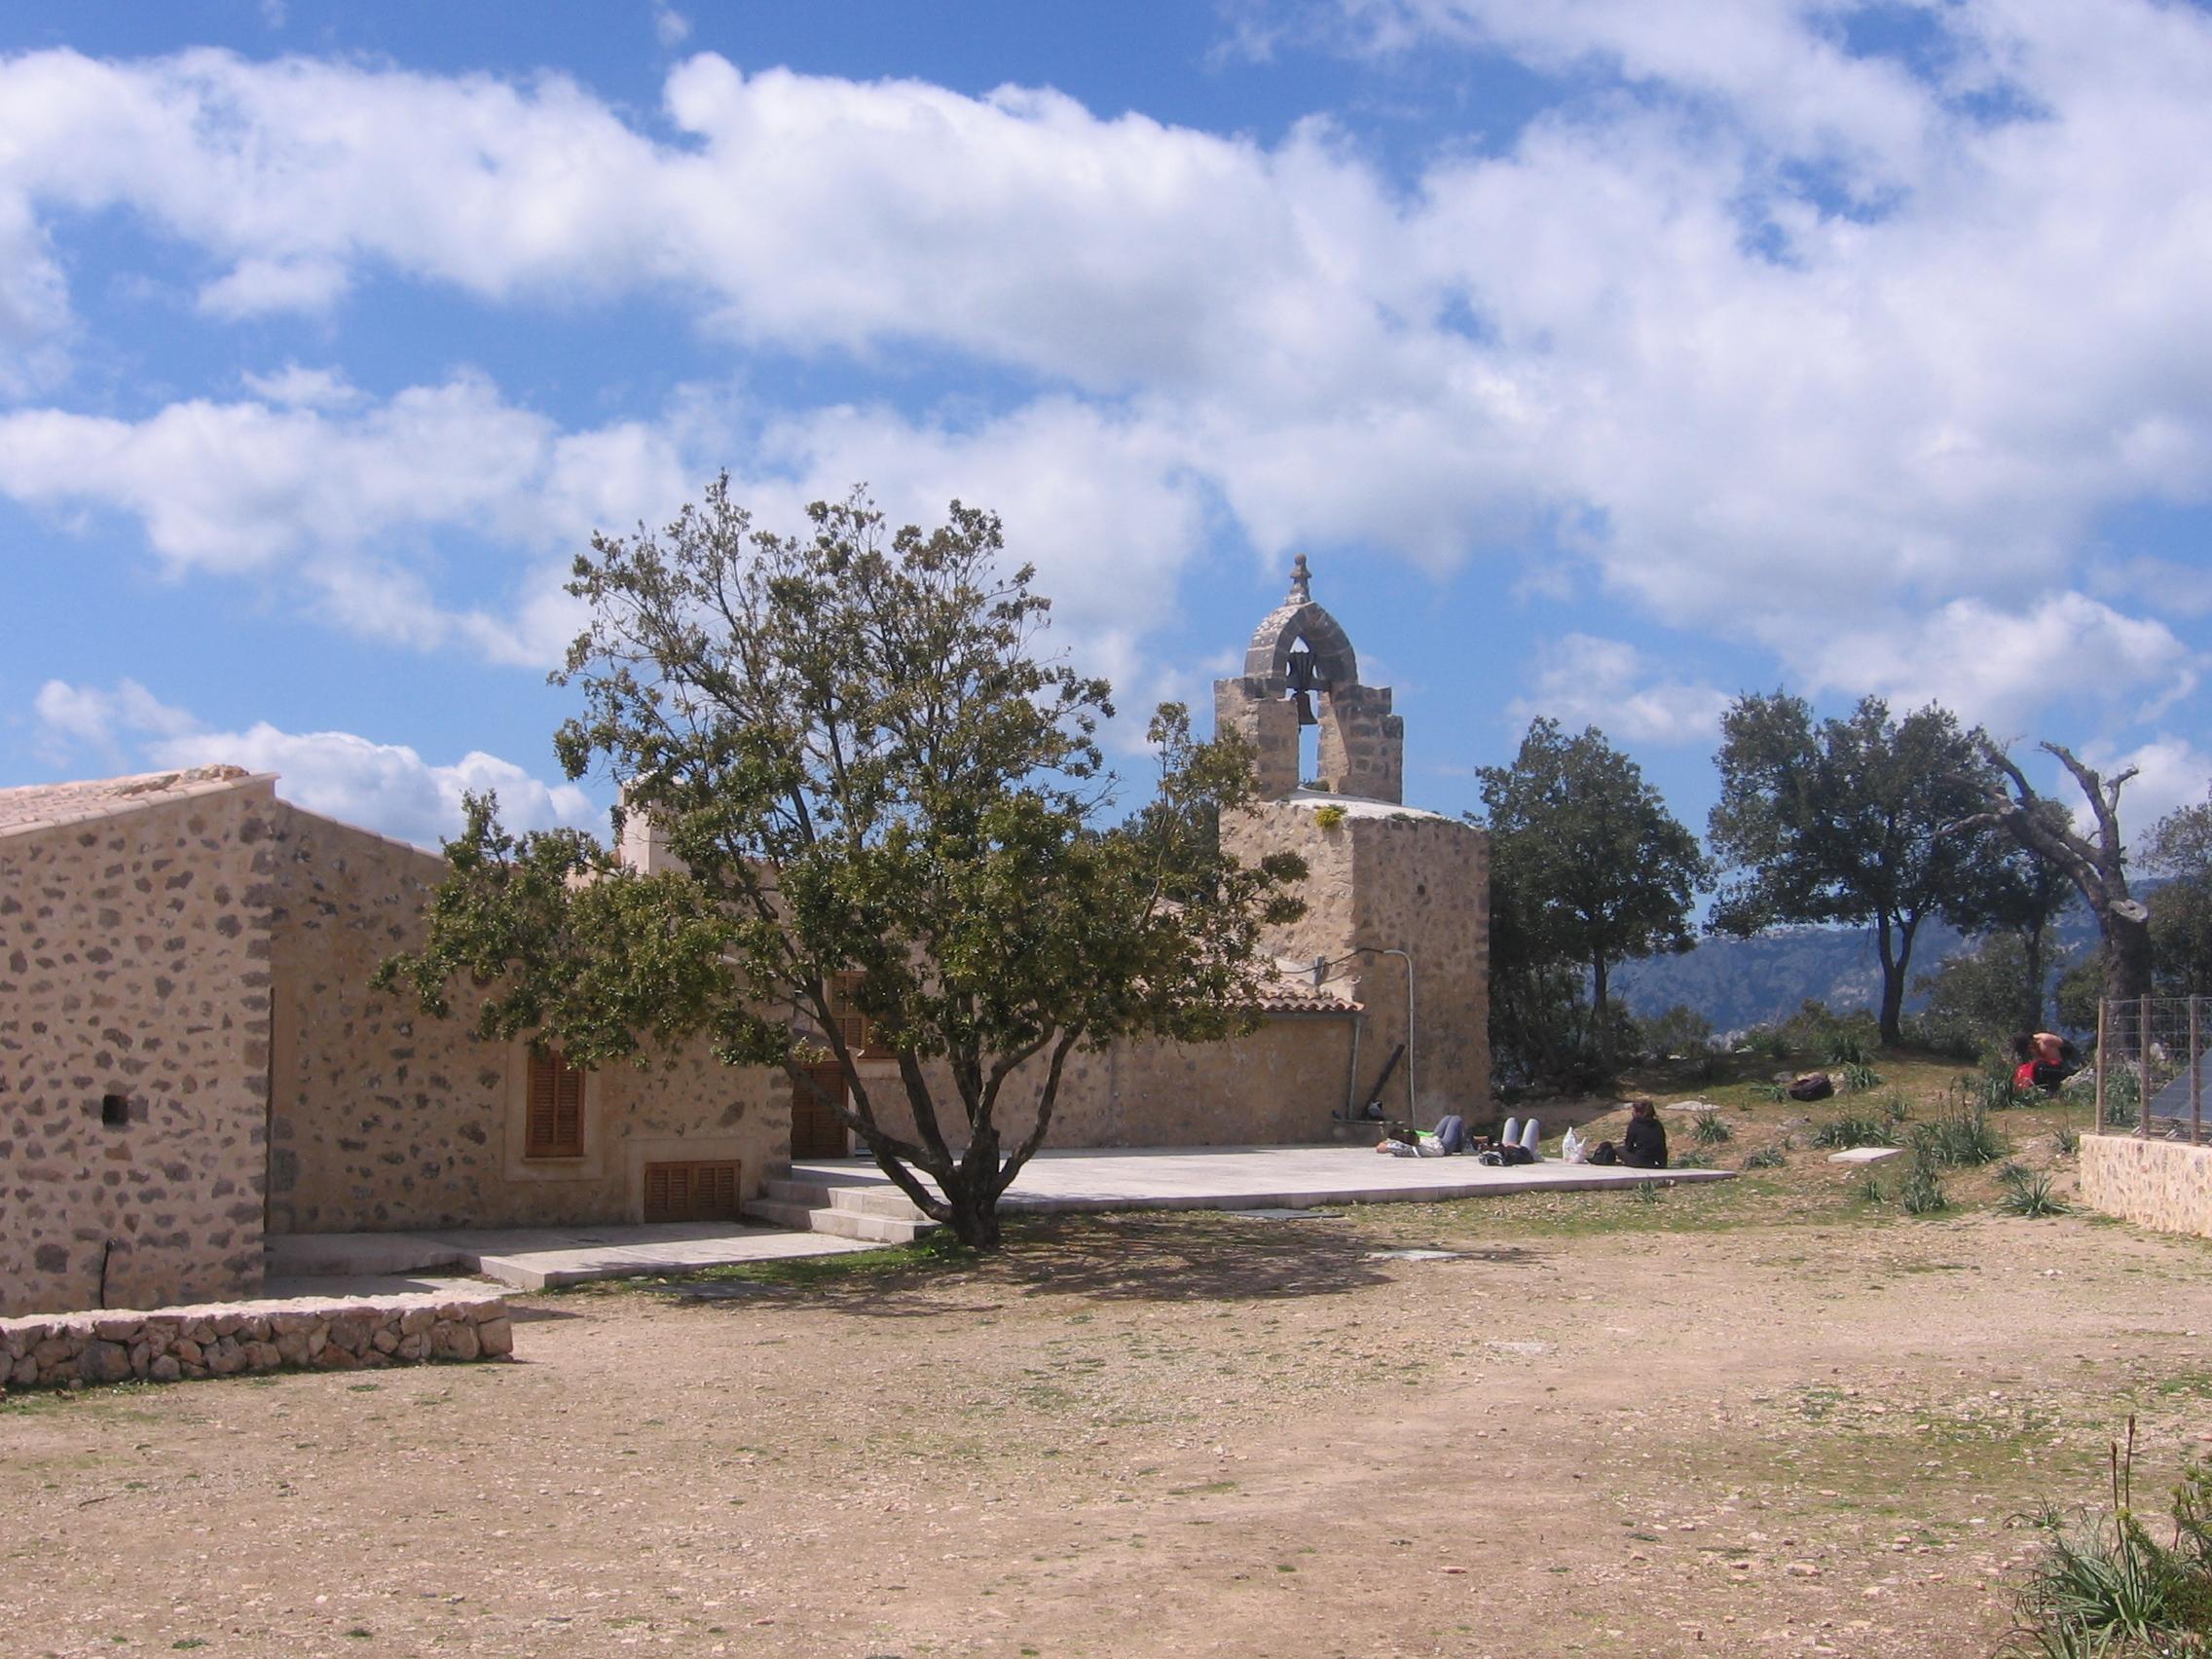 File:Castell dAlaro 6.JPG - Wikimedia Commons